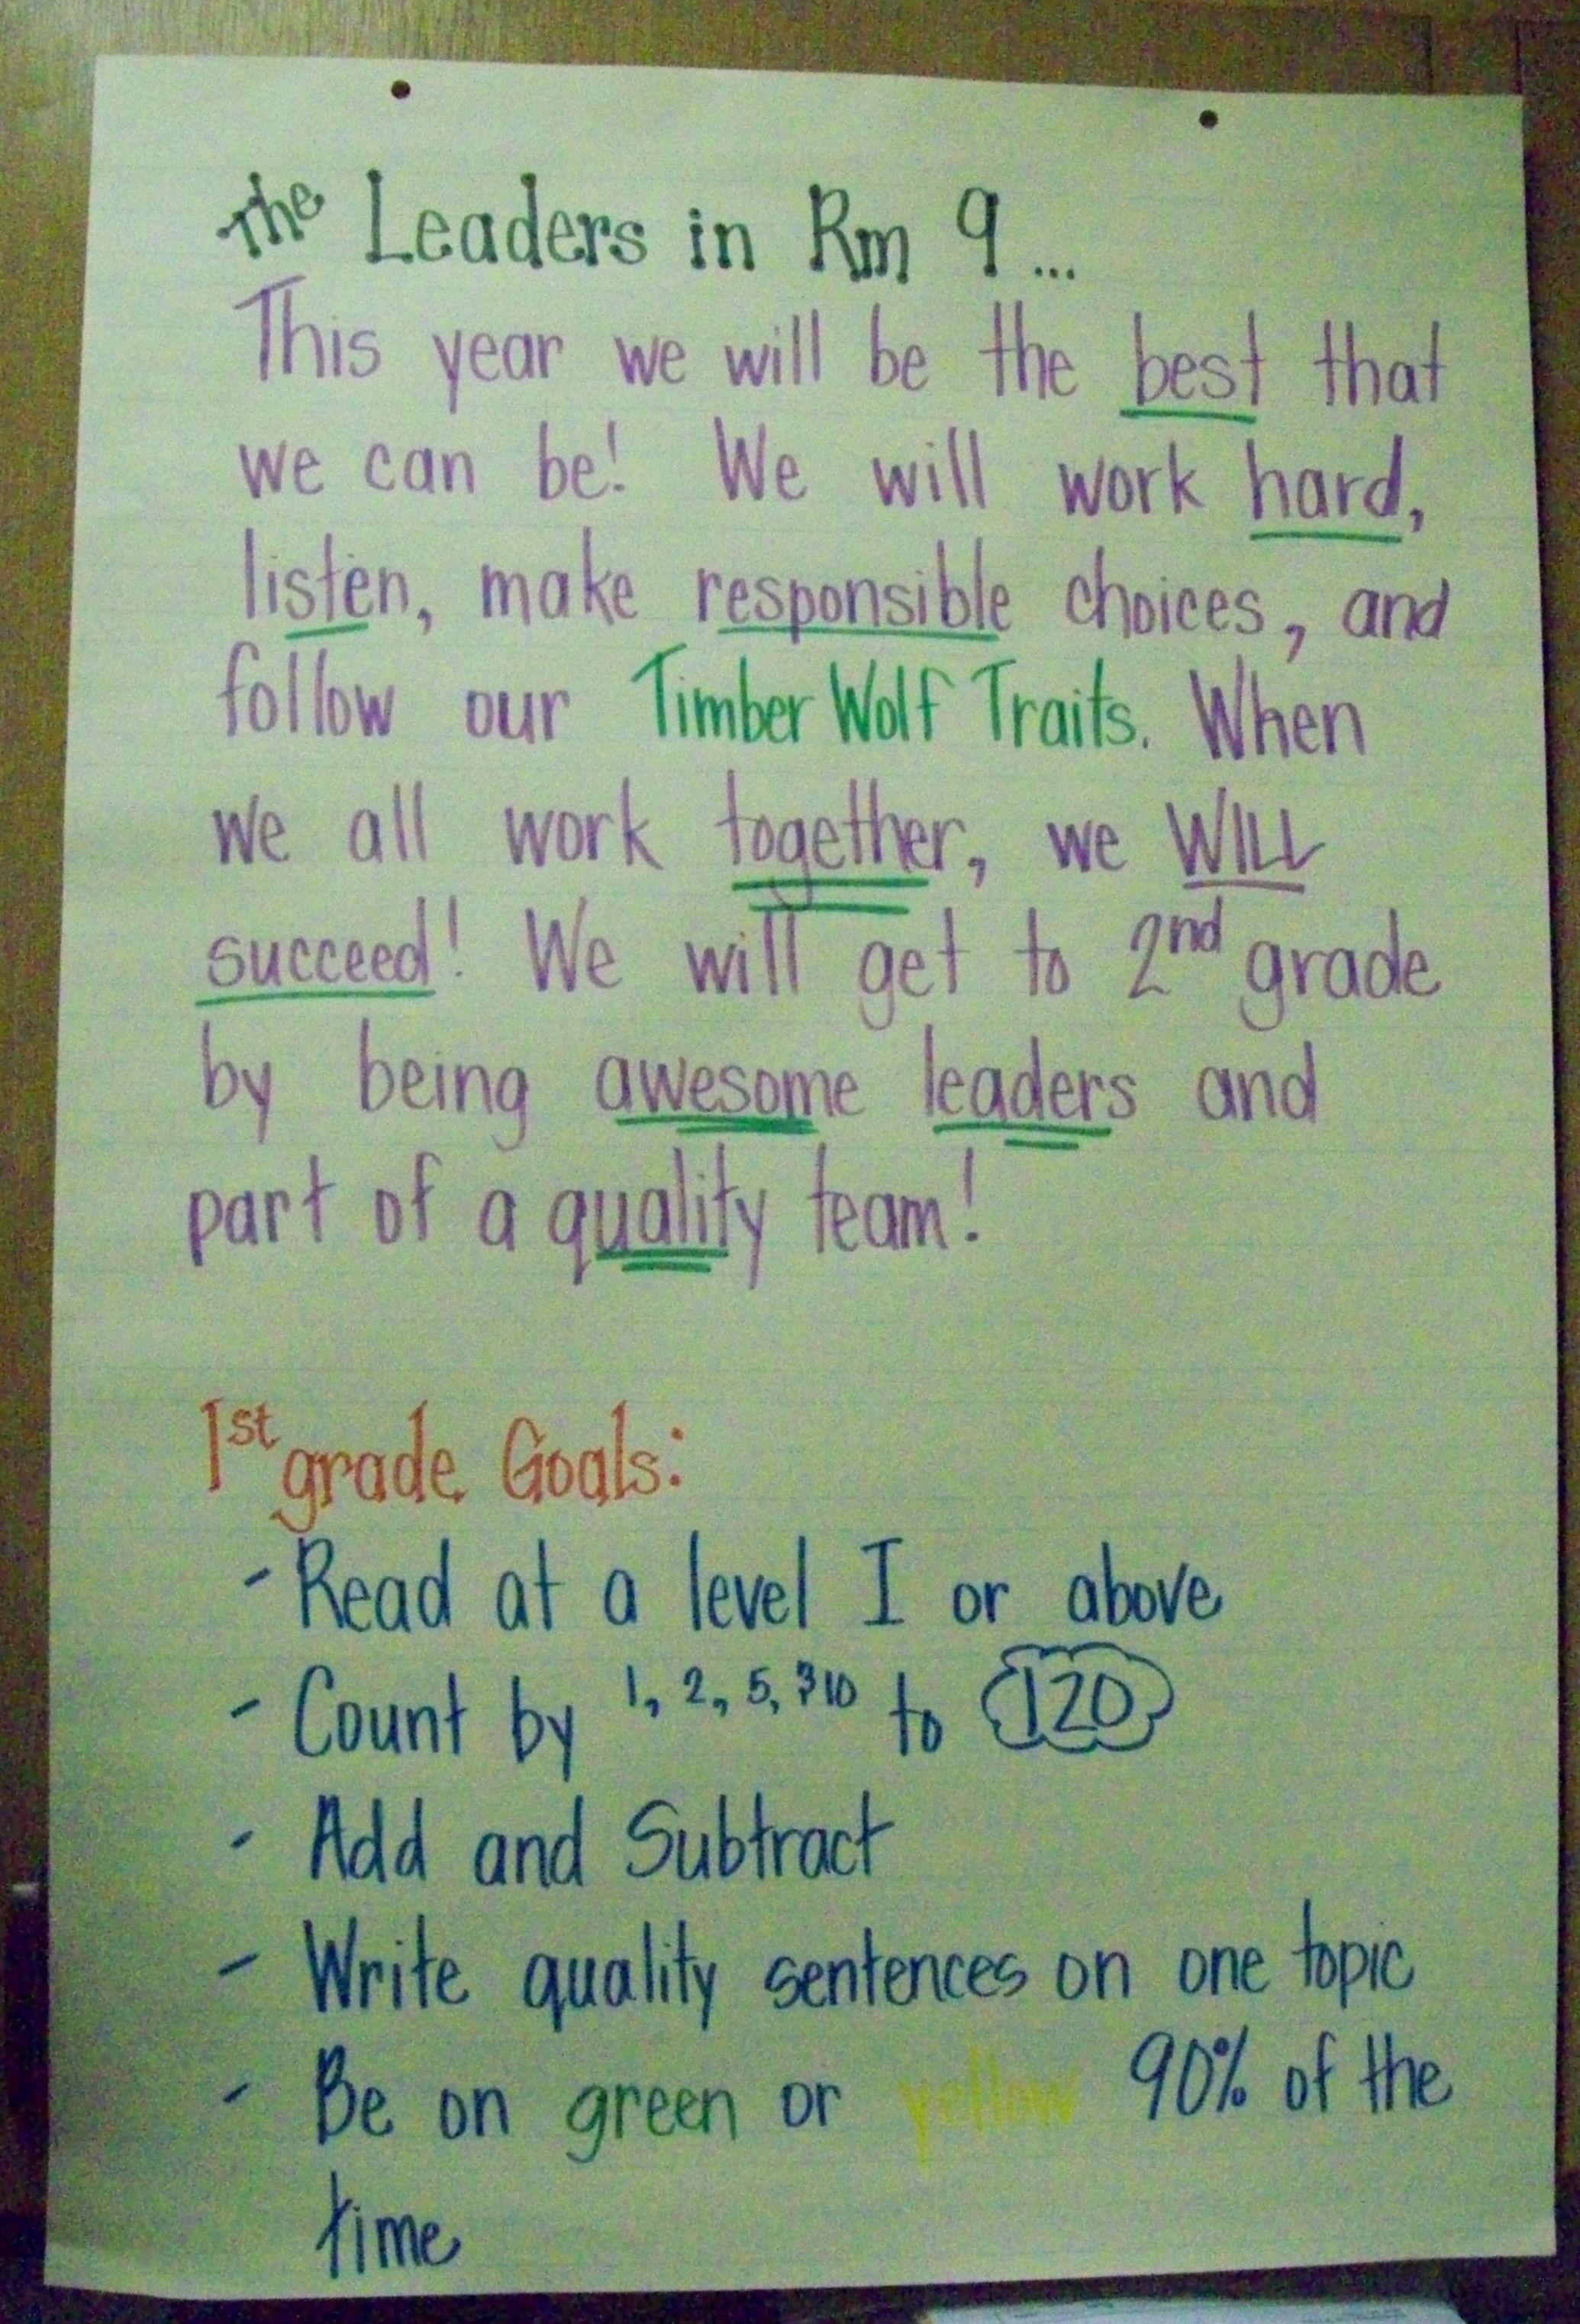 Classroom Pledge Ideas : Our class pledge education ideas pinterest